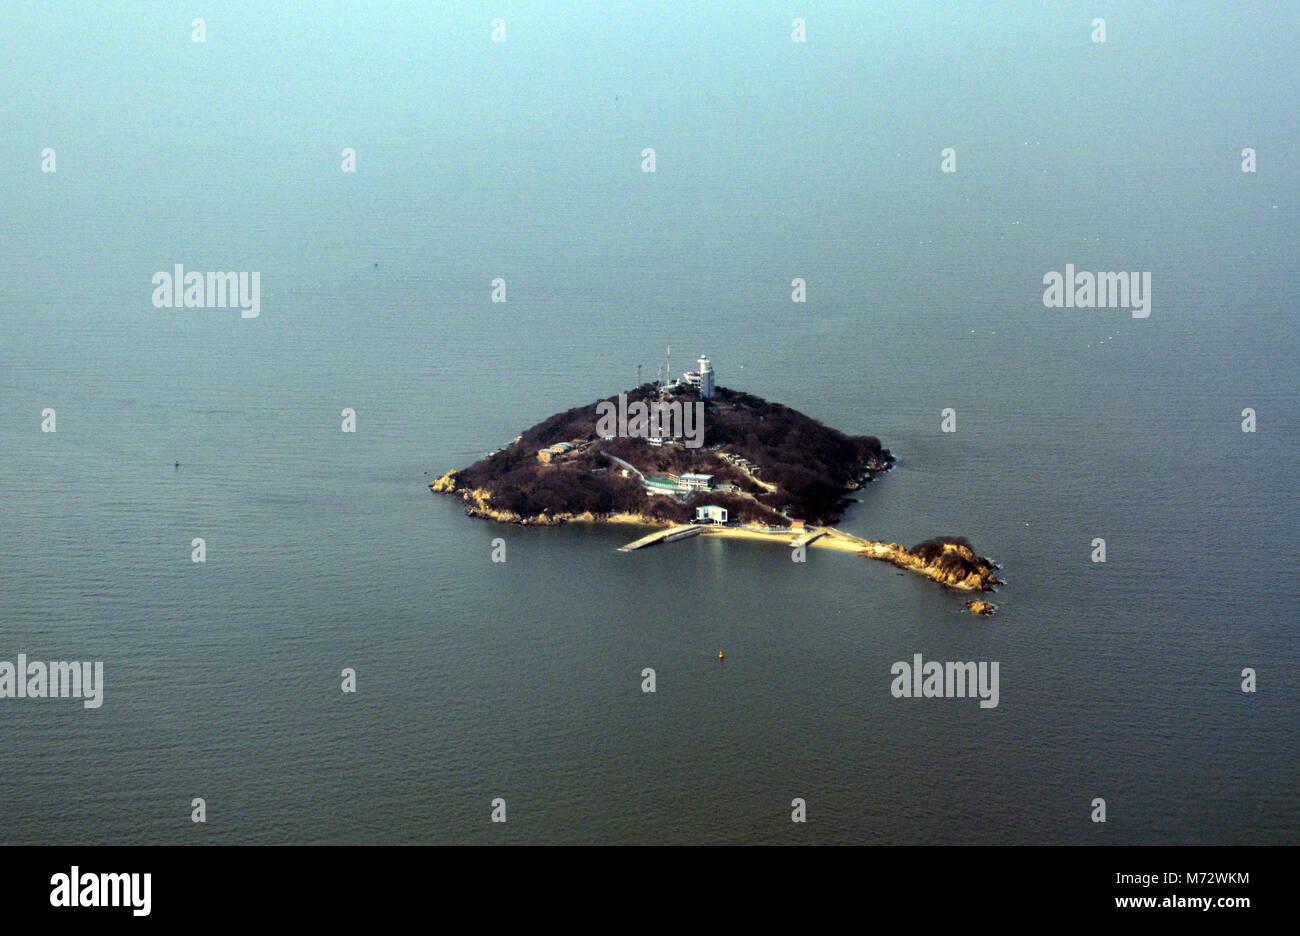 Palmido Island near Incheon, Korea. - Stock Image